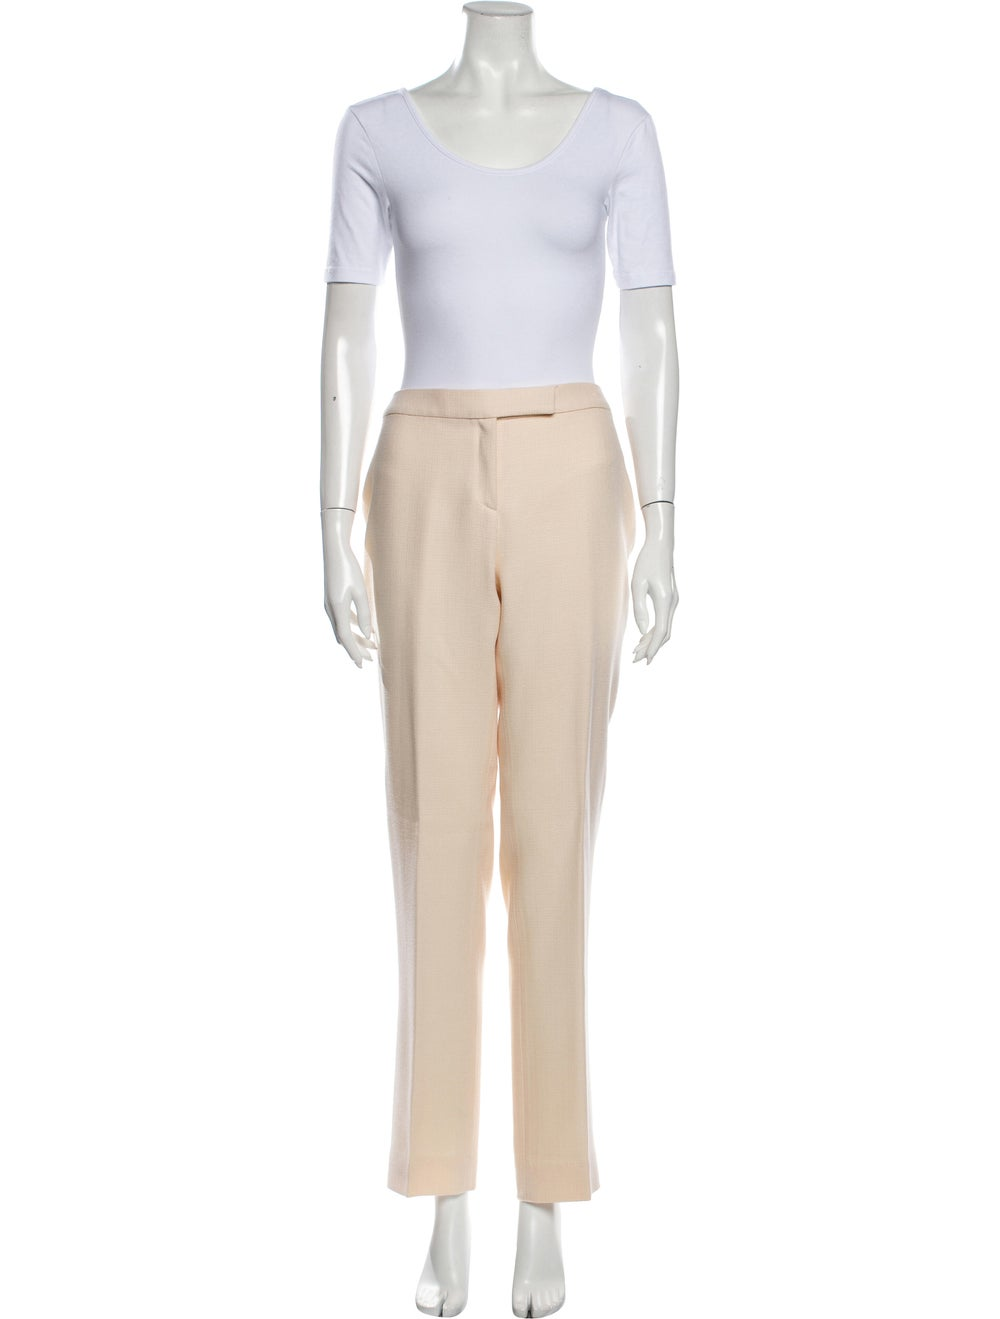 Gianni Versace Vintage 1990's Pantsuit - image 4